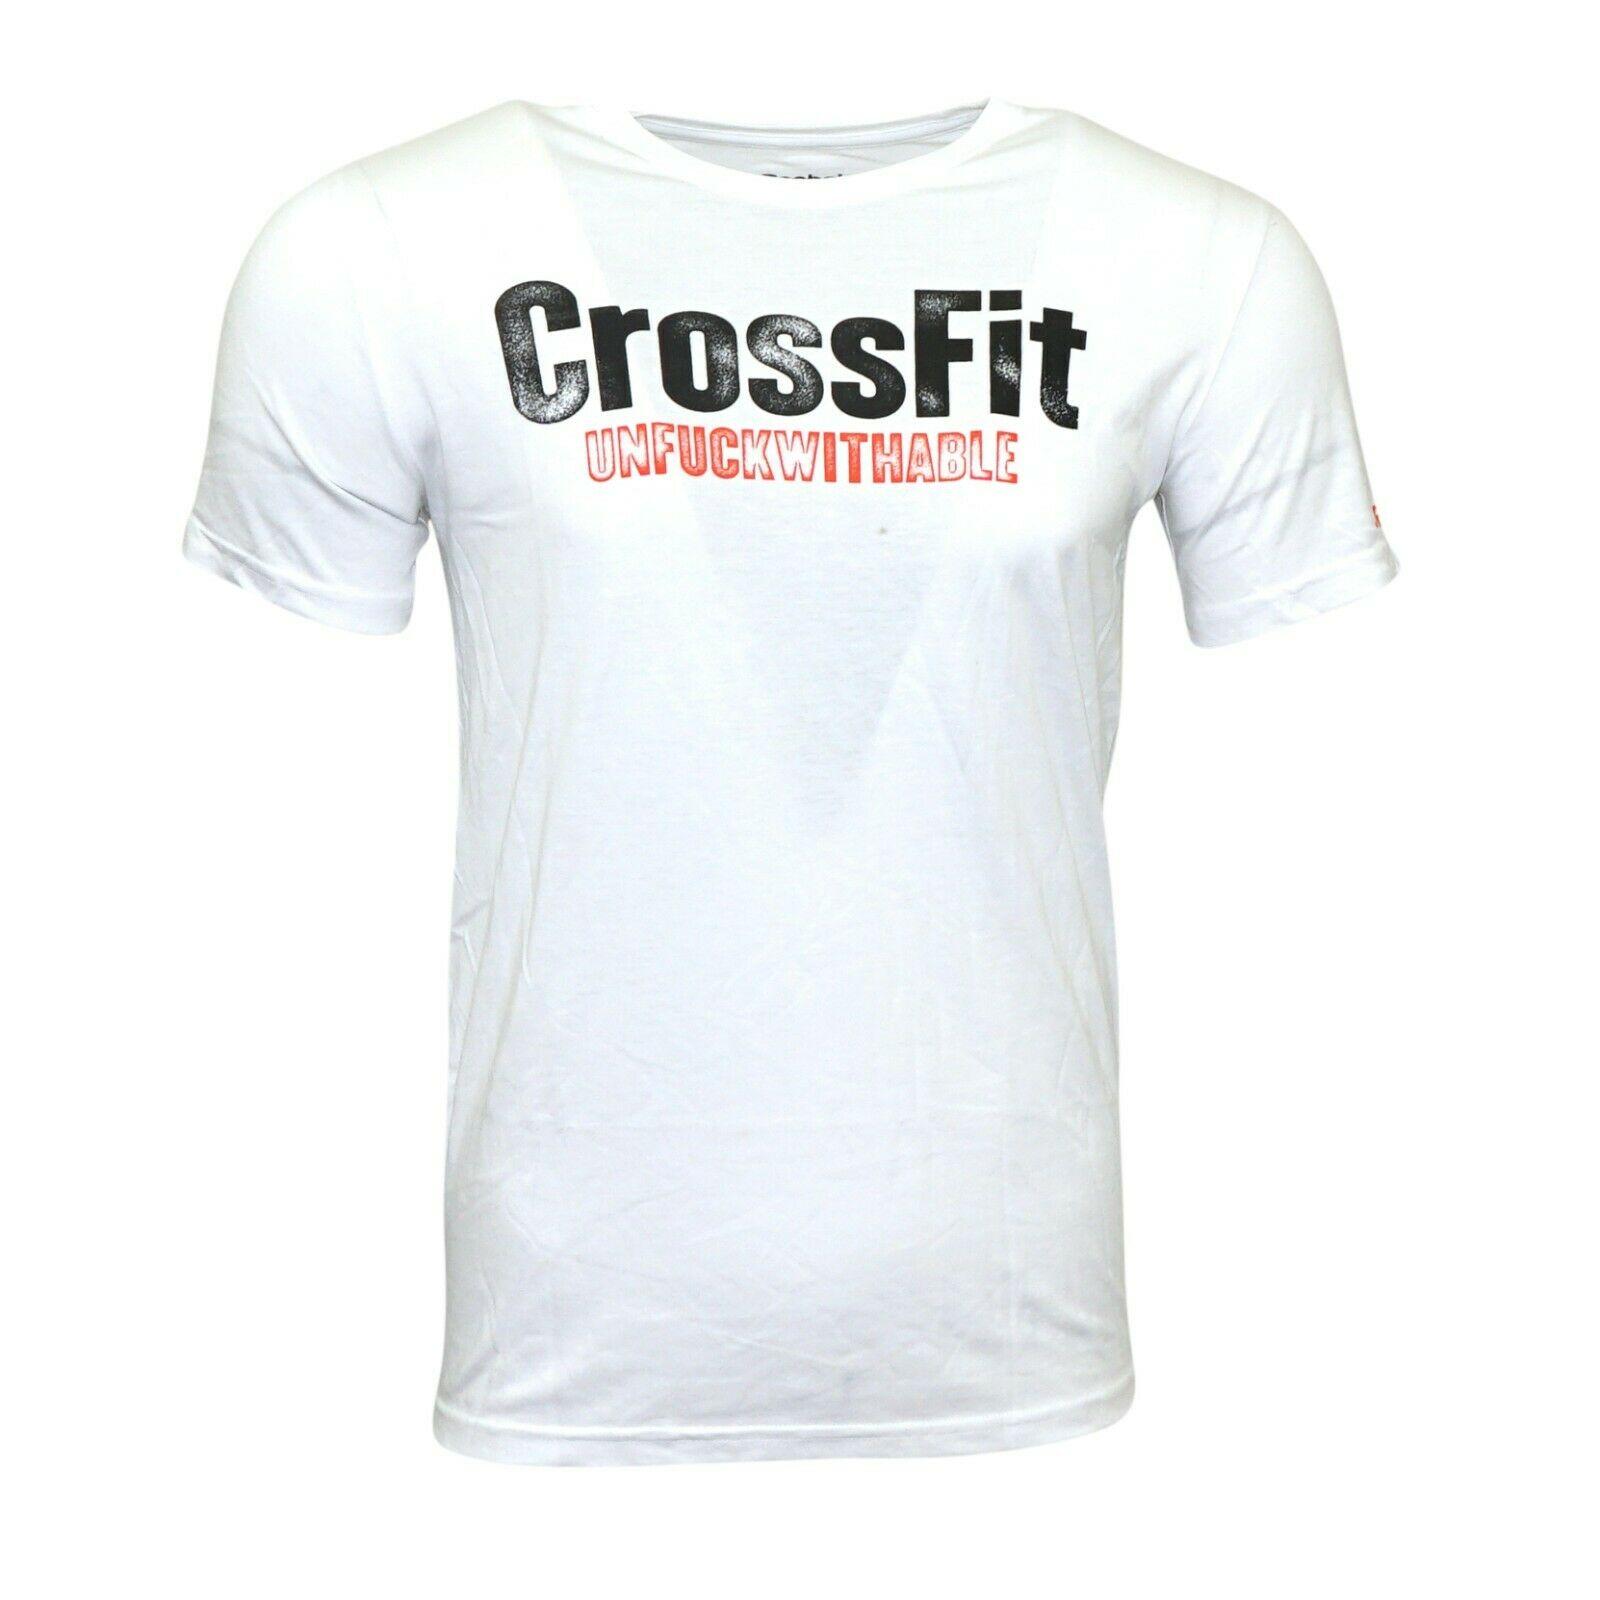 Camiseta Reebok Crossfit Graphic  - Rei do Wod